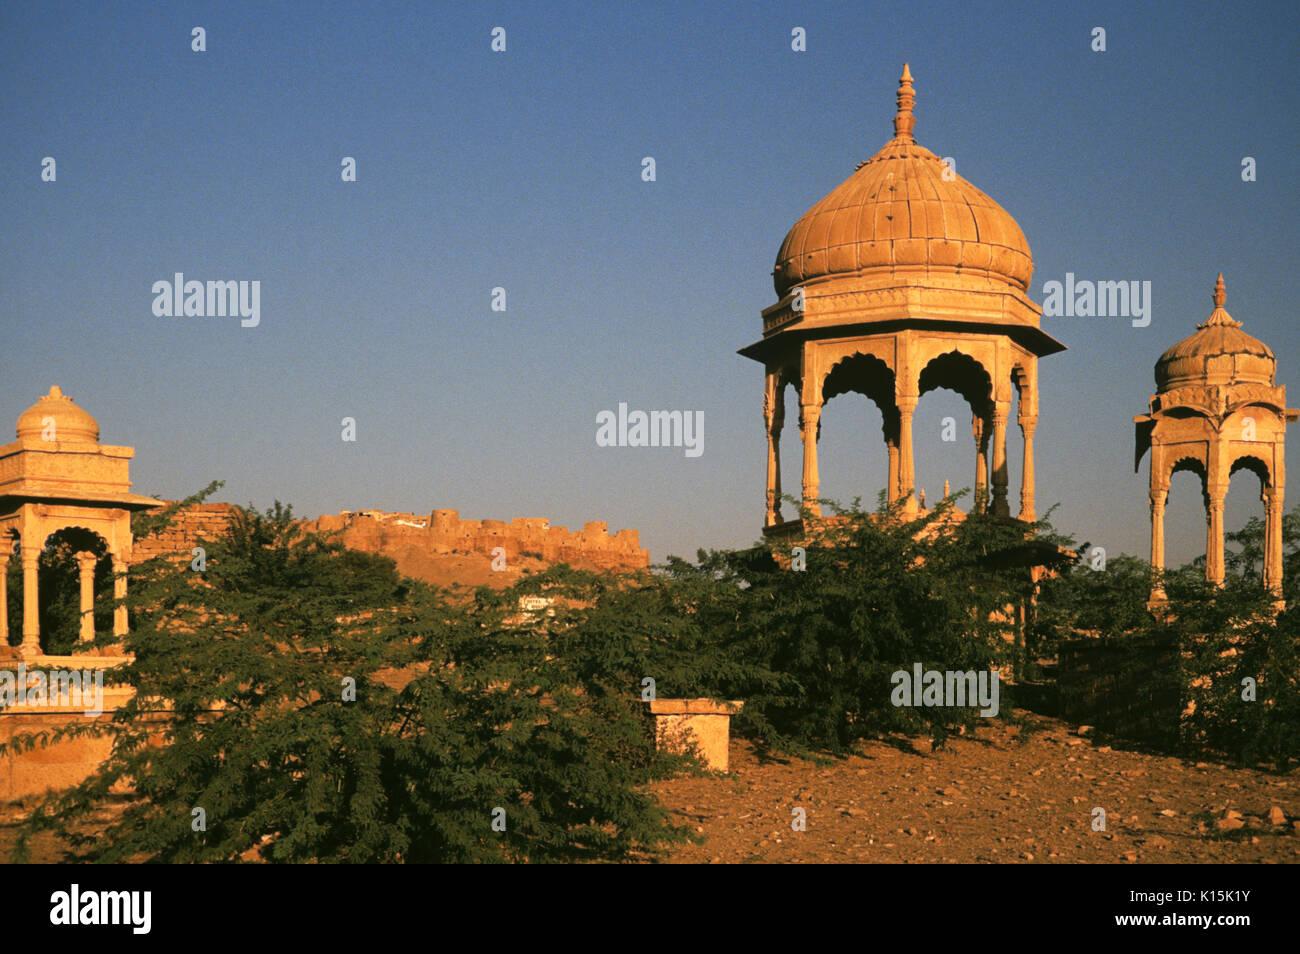 Bada Bagh royal cenotaphs and Jaisalmer Fort, Jaisalmer, Rajasthan, India - Stock Image